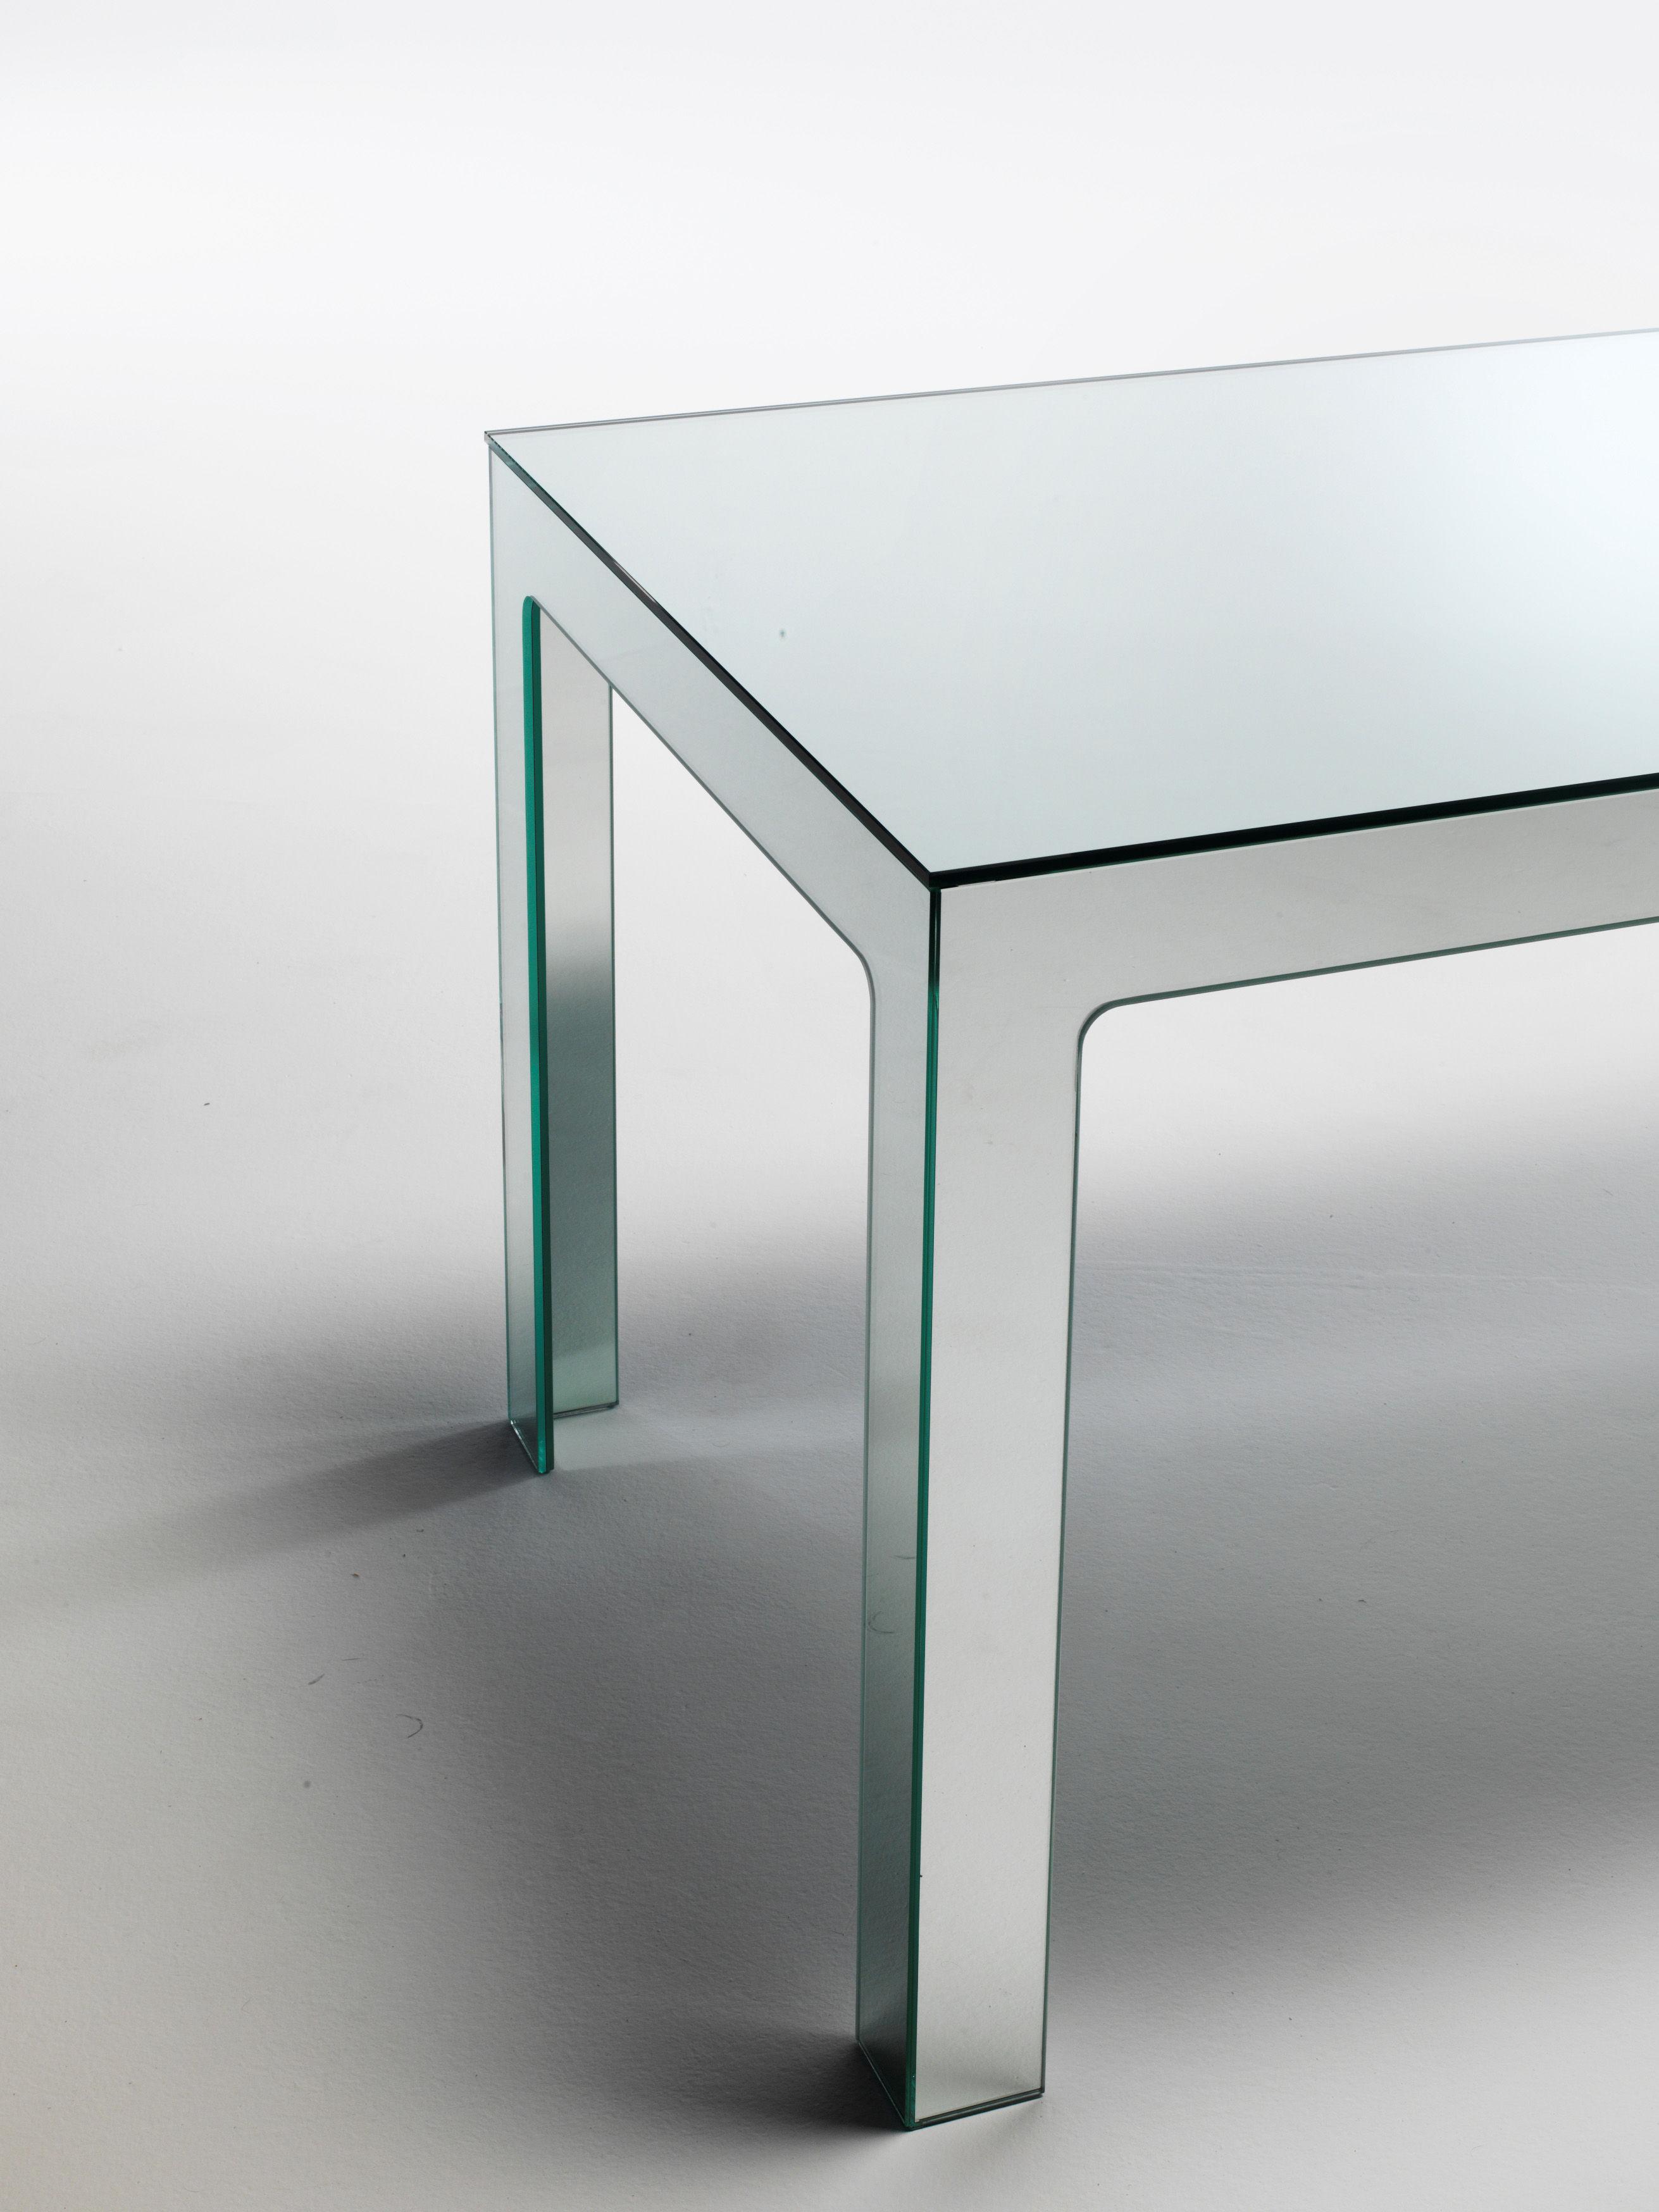 mirror mirror 200 x 80 cm glas italia tisch. Black Bedroom Furniture Sets. Home Design Ideas